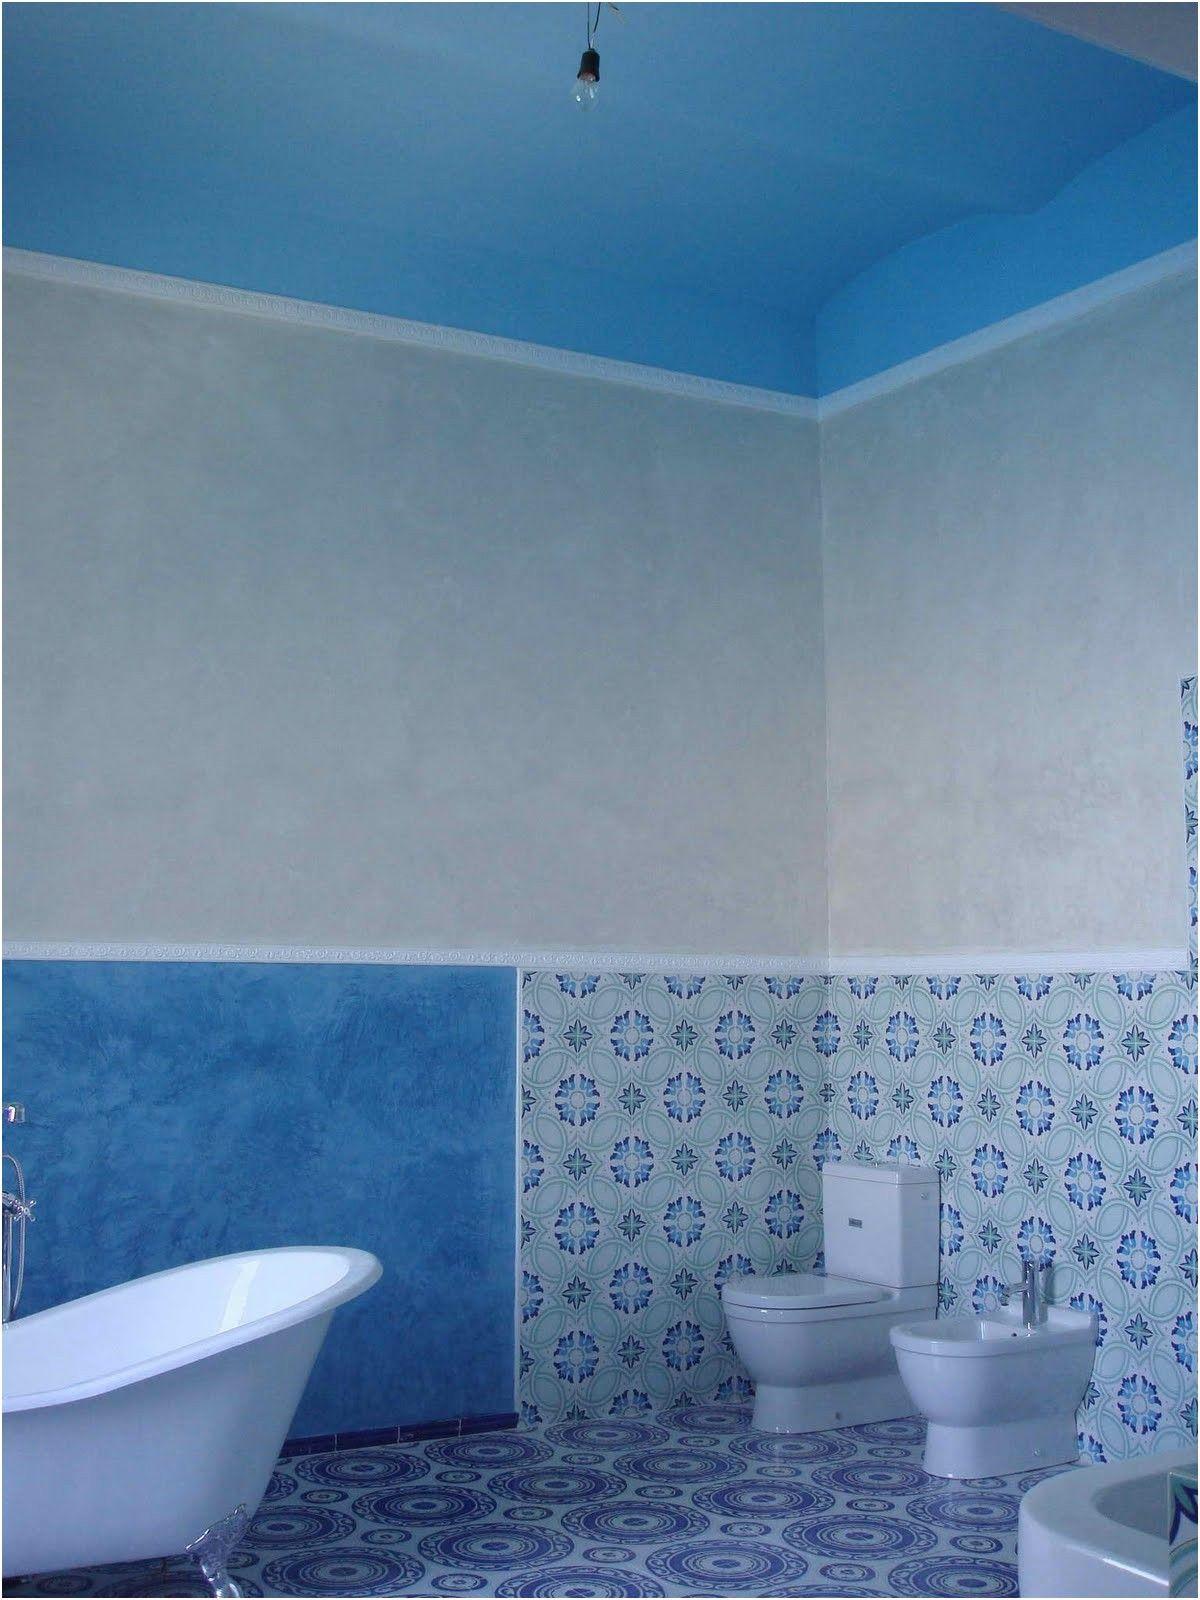 Bathroom Tiles Blue Colour Ceramic For Home From